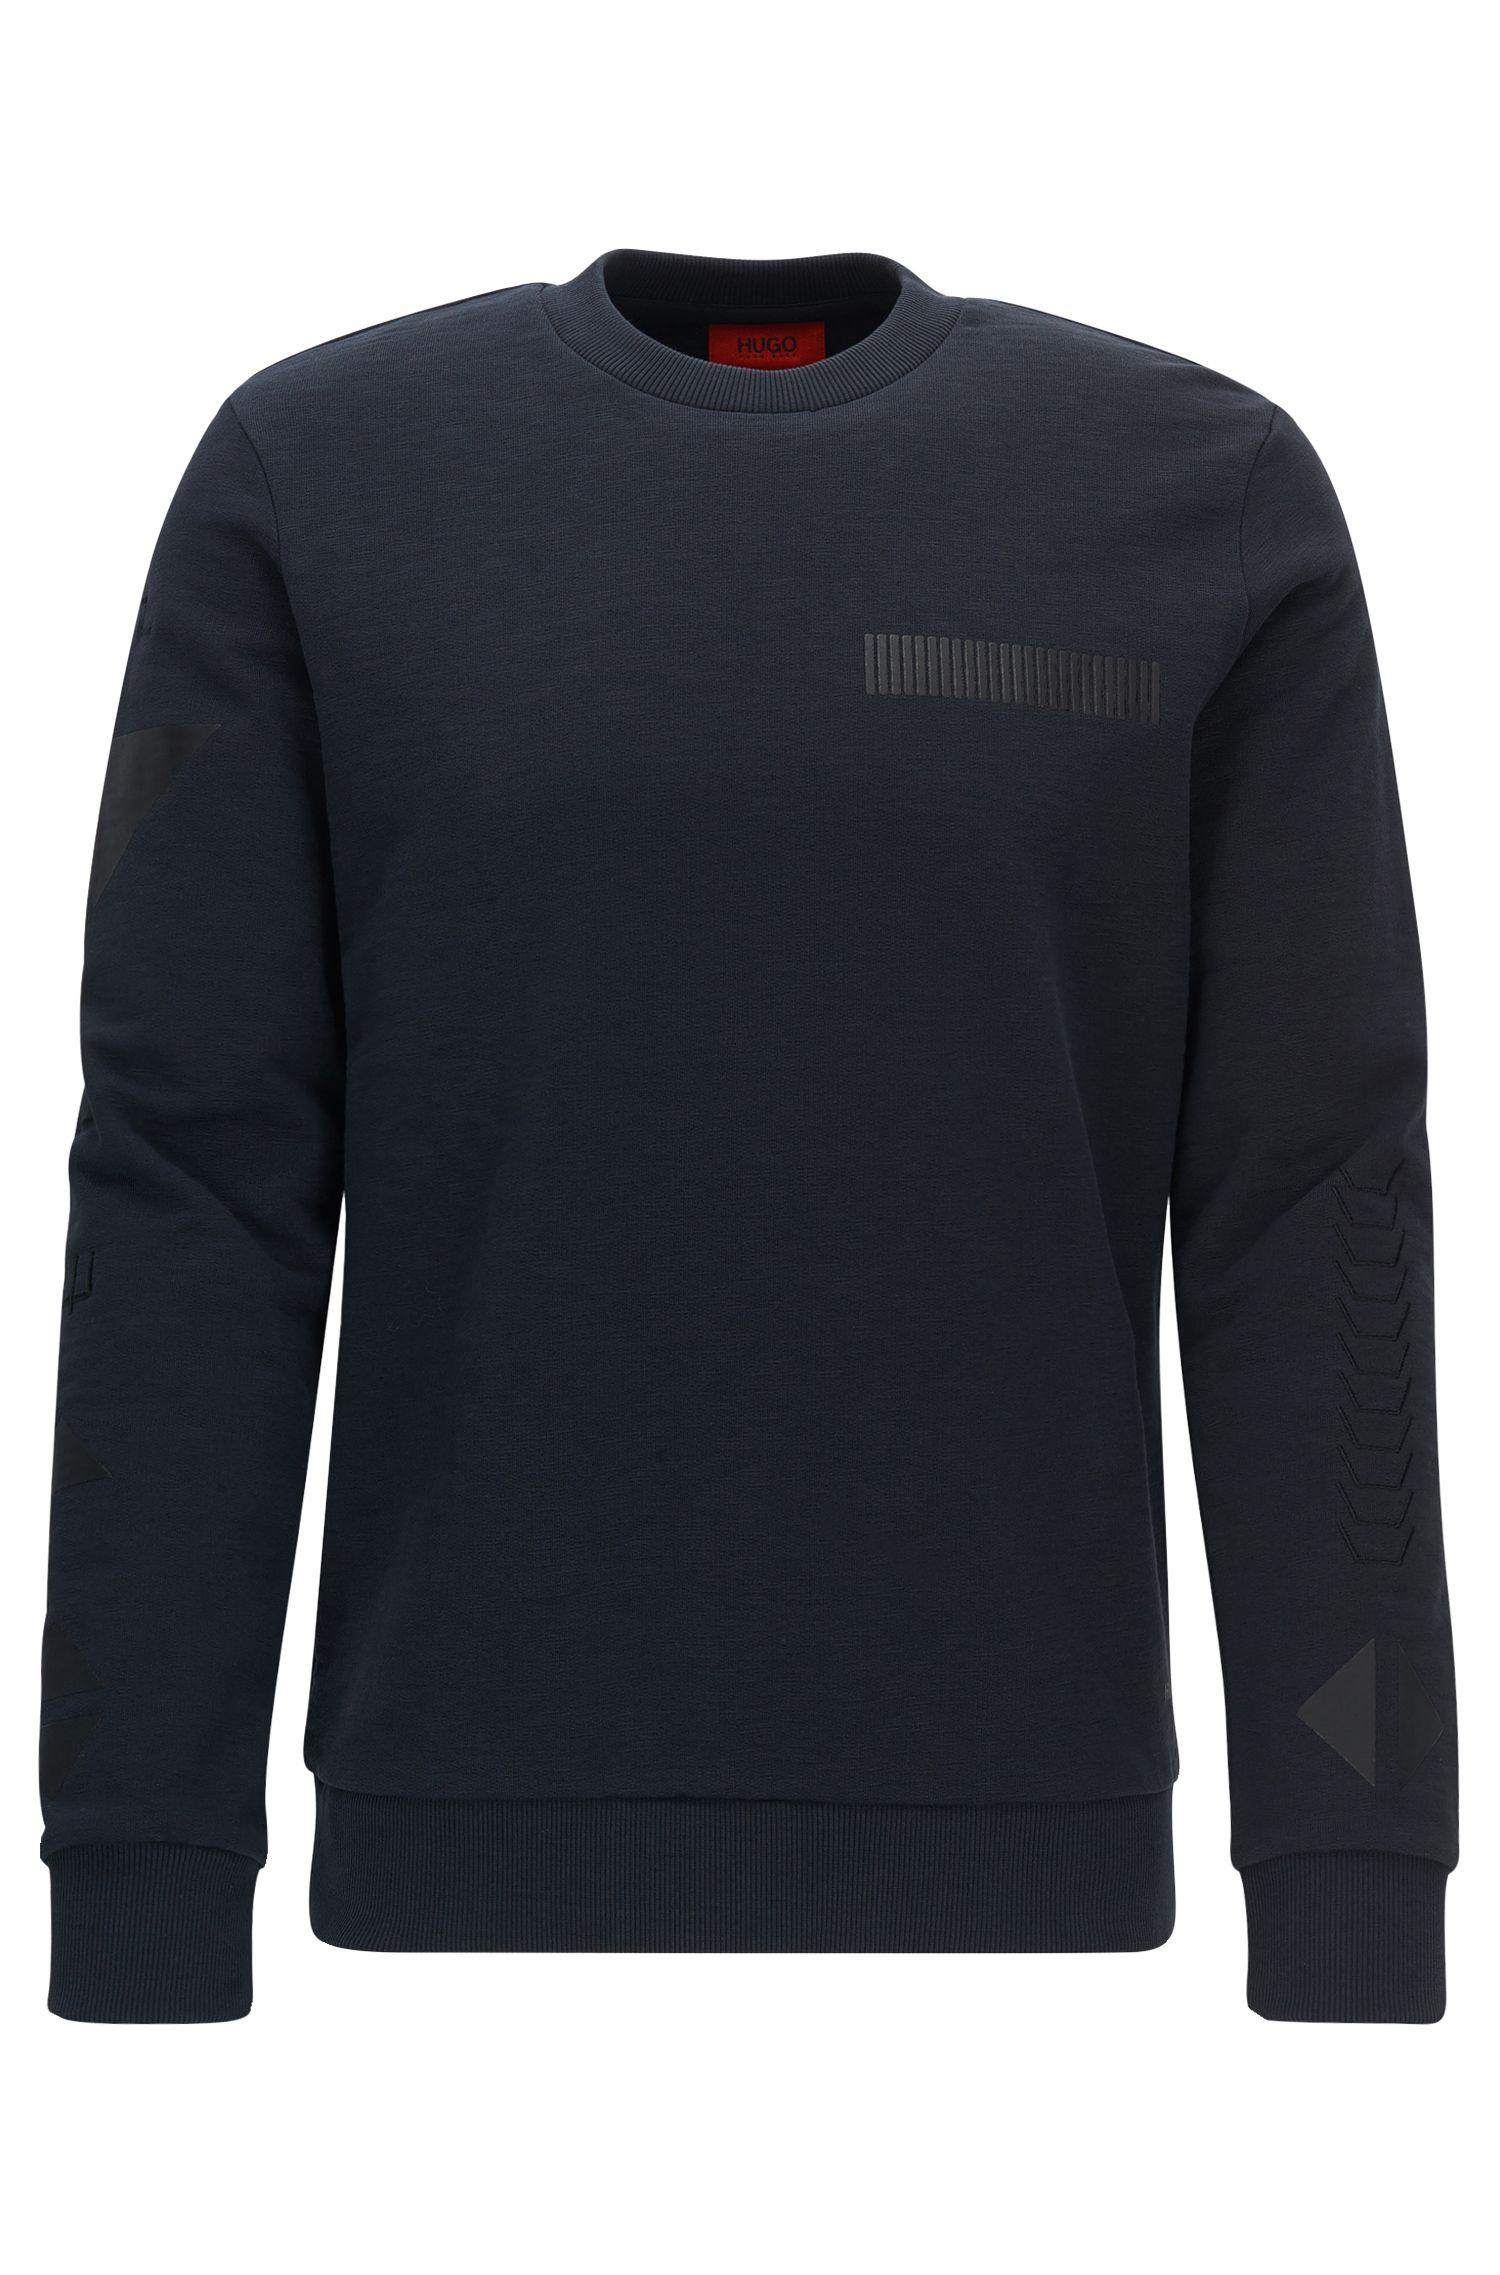 Printed Fleece Cotton Sweatershirt | Dopkins